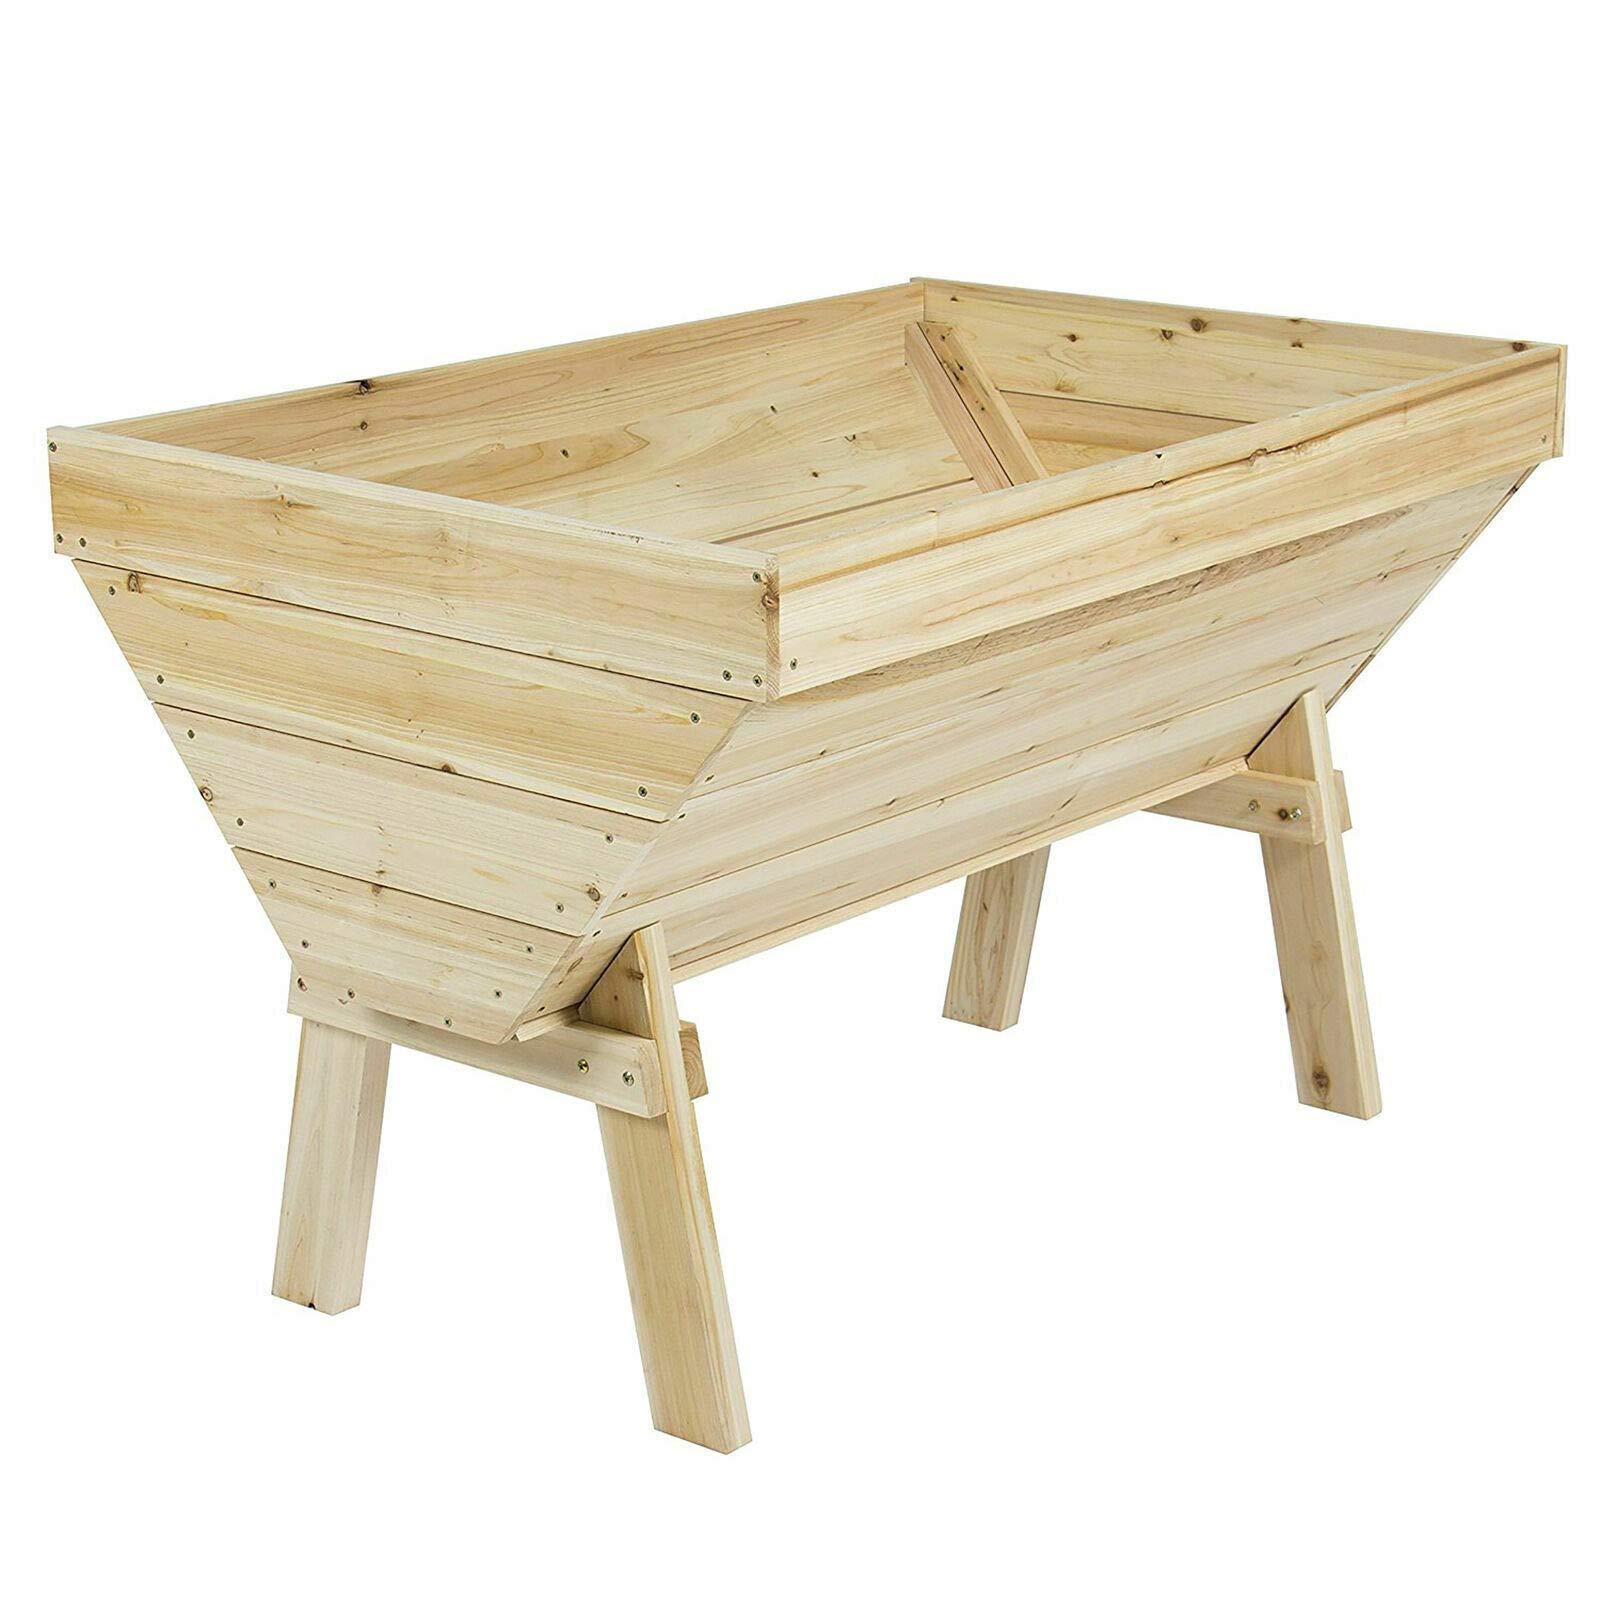 RX-789 Wood Raised Vegetable Garden Bed Elevated Cedar V Shape Planter Box Brown 4Ftx3Ft